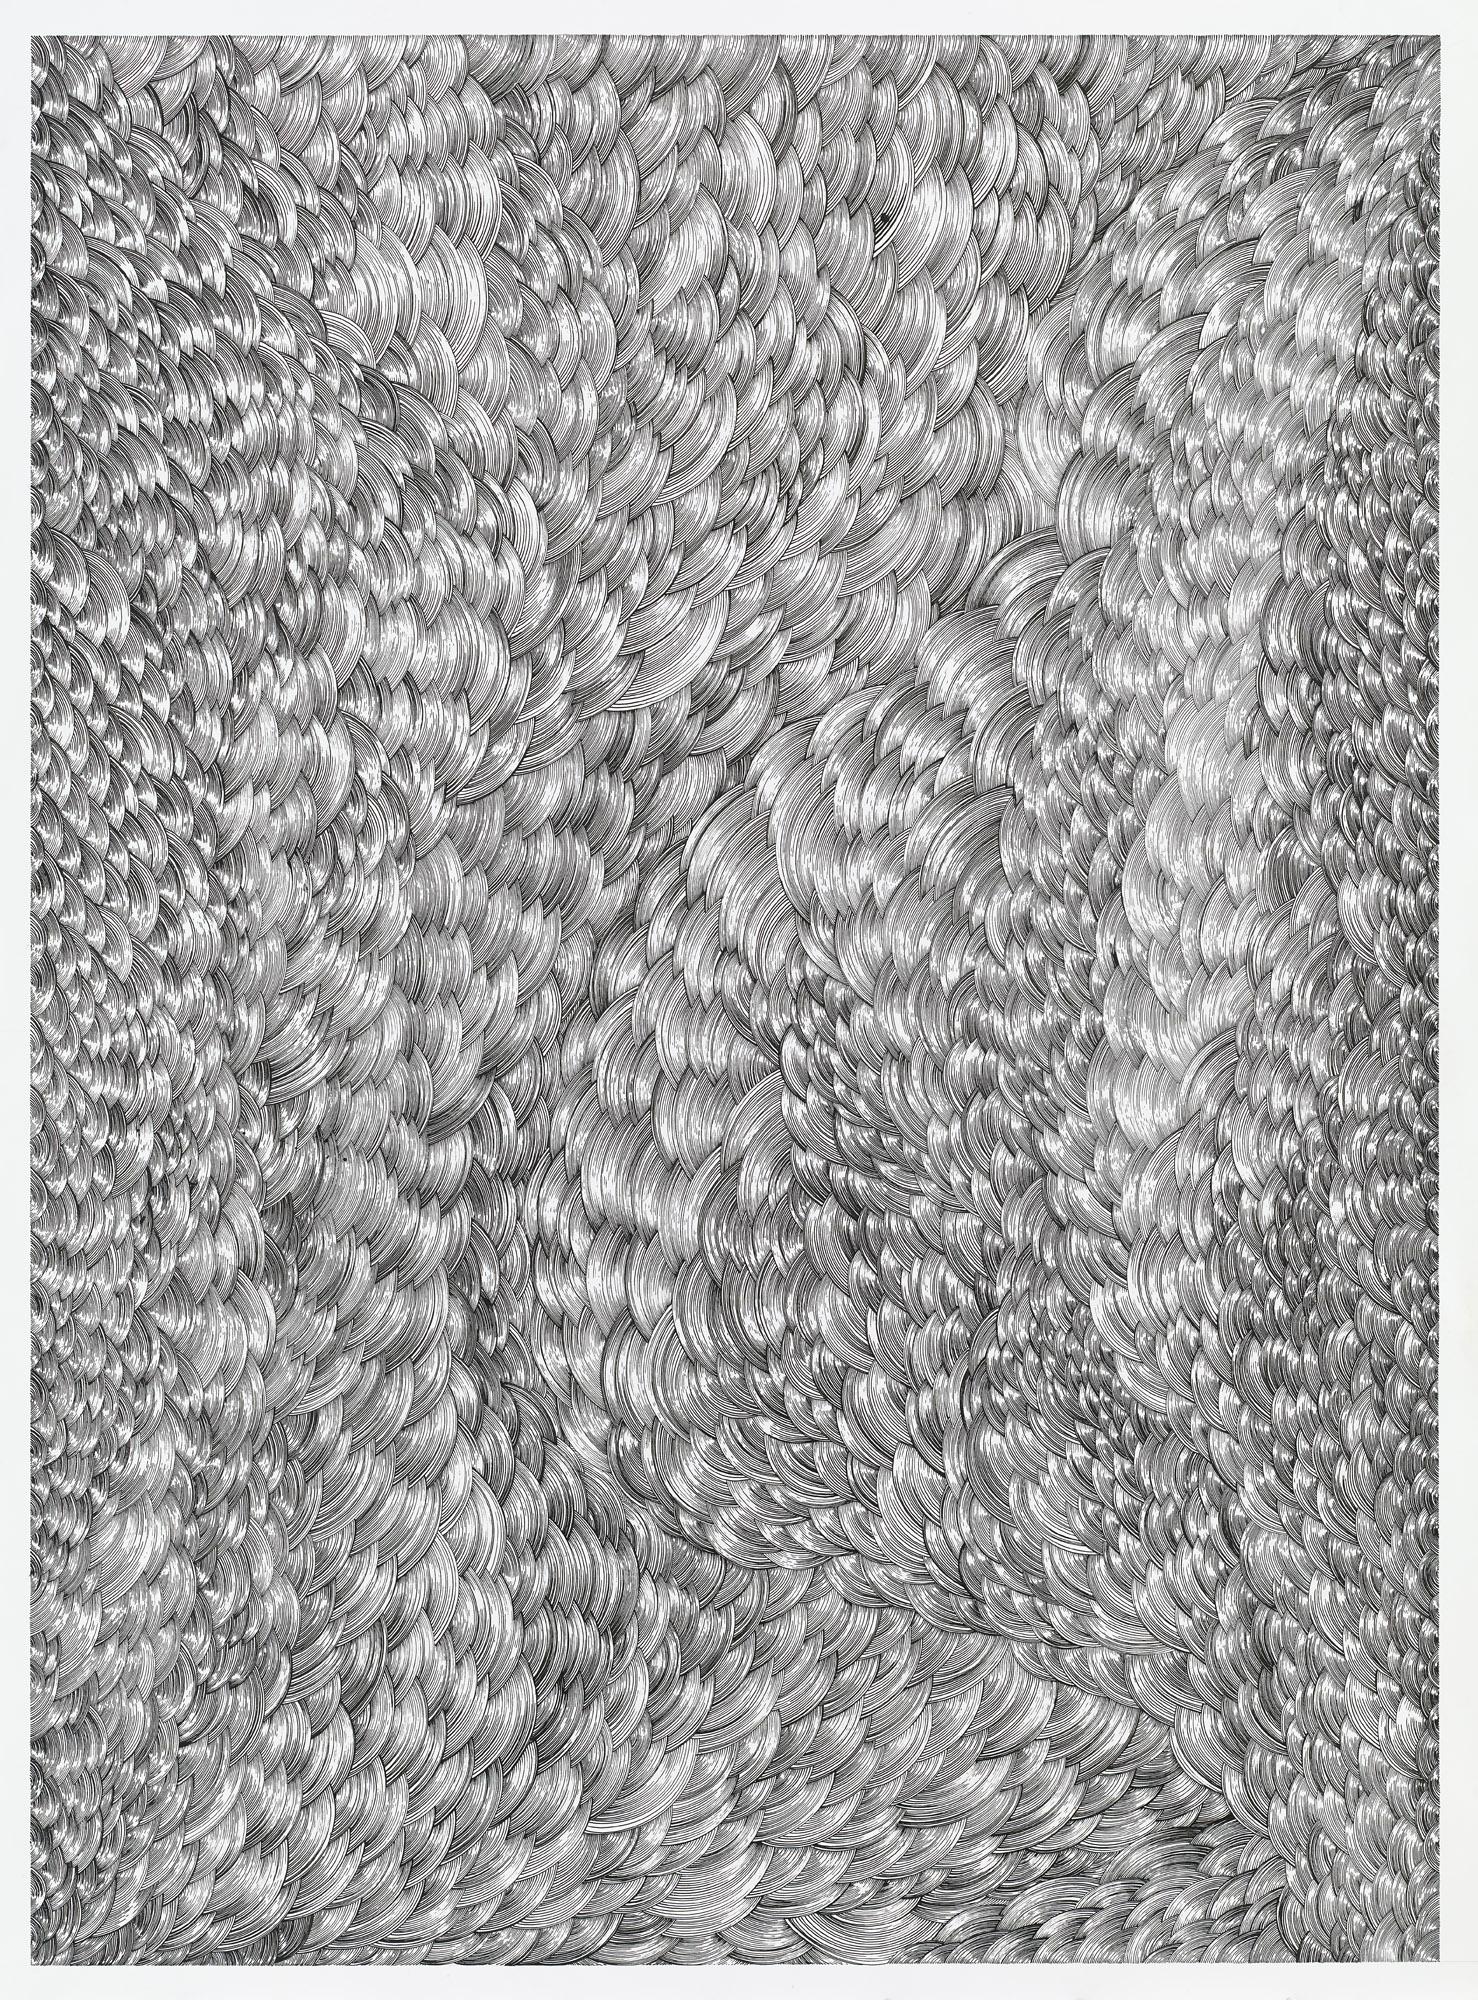 BK P158 | diptychon part A | untitled | acrylic on paper | 200x170cm | 2014 | collection kunstwerk Alison & Peter W. Klein